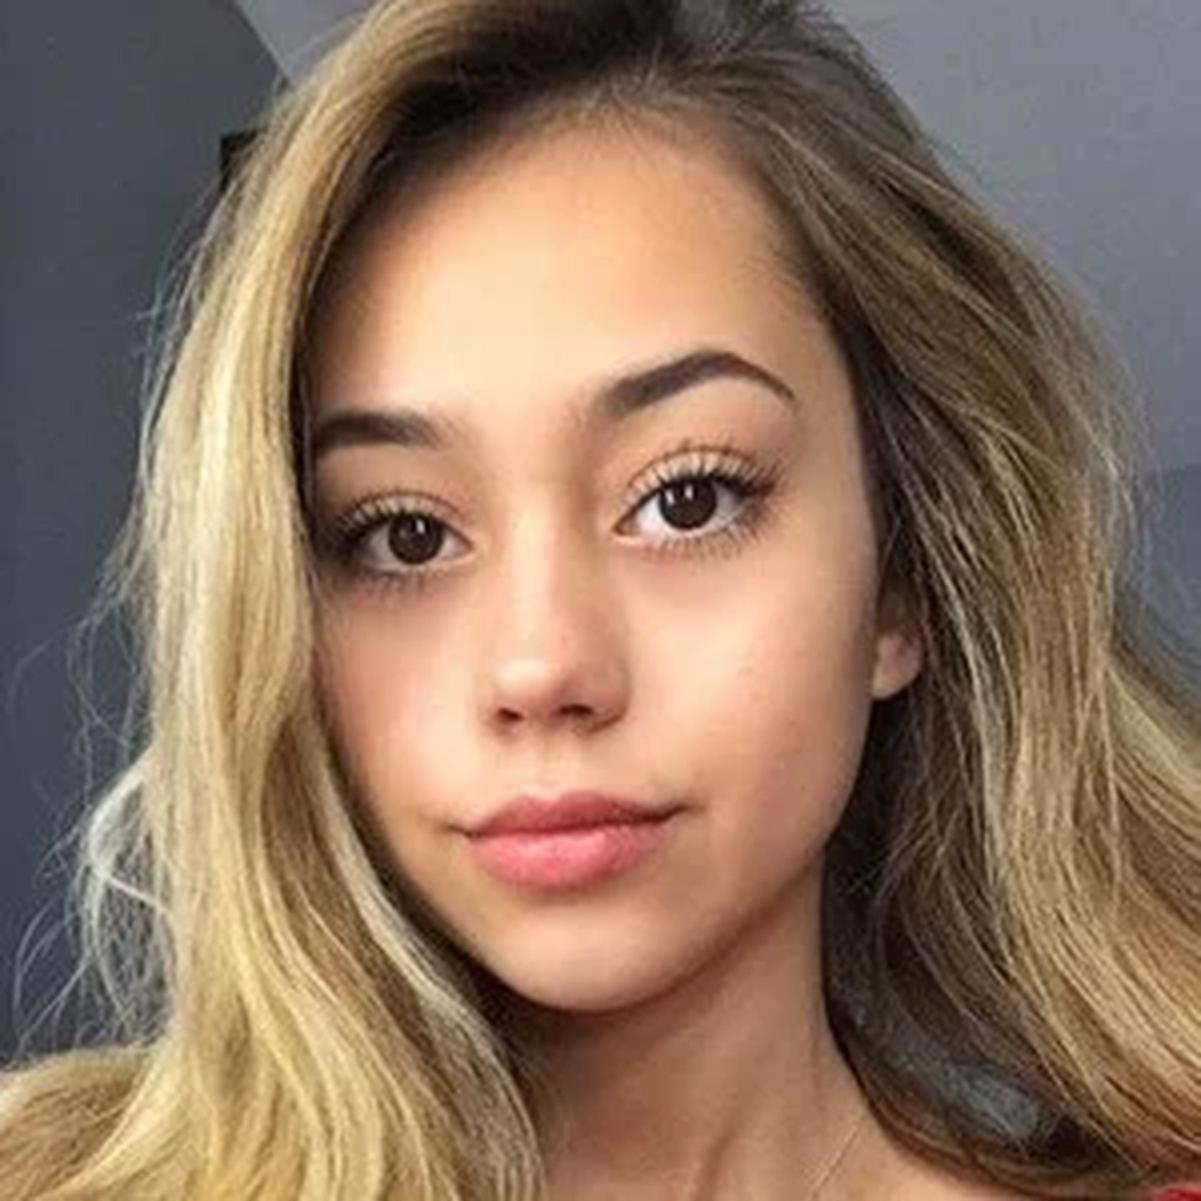 Ivanita Lomeli Wiki & Bio